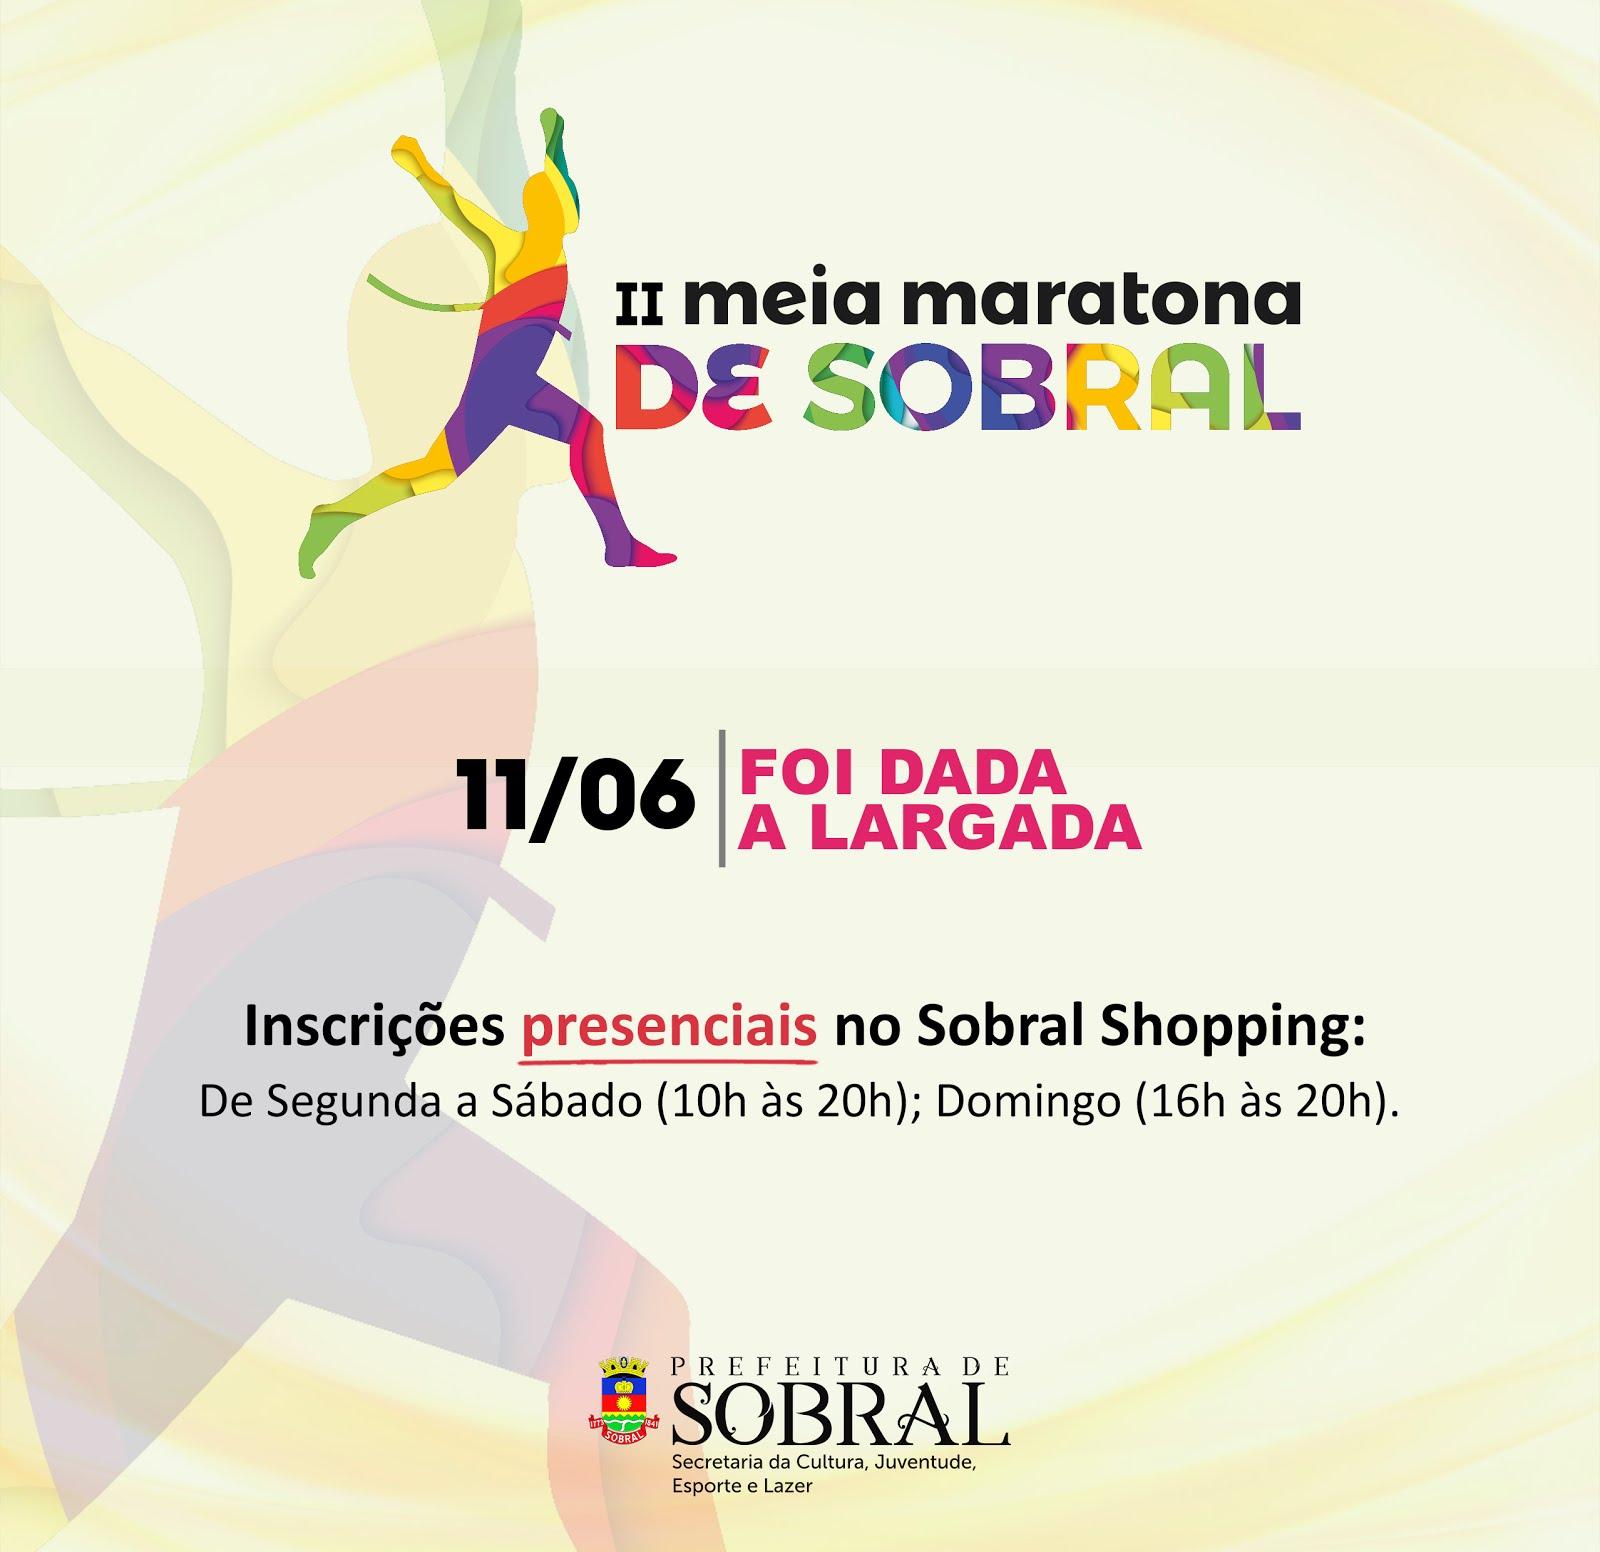 II MEIA MARATONA DE SOBRAL